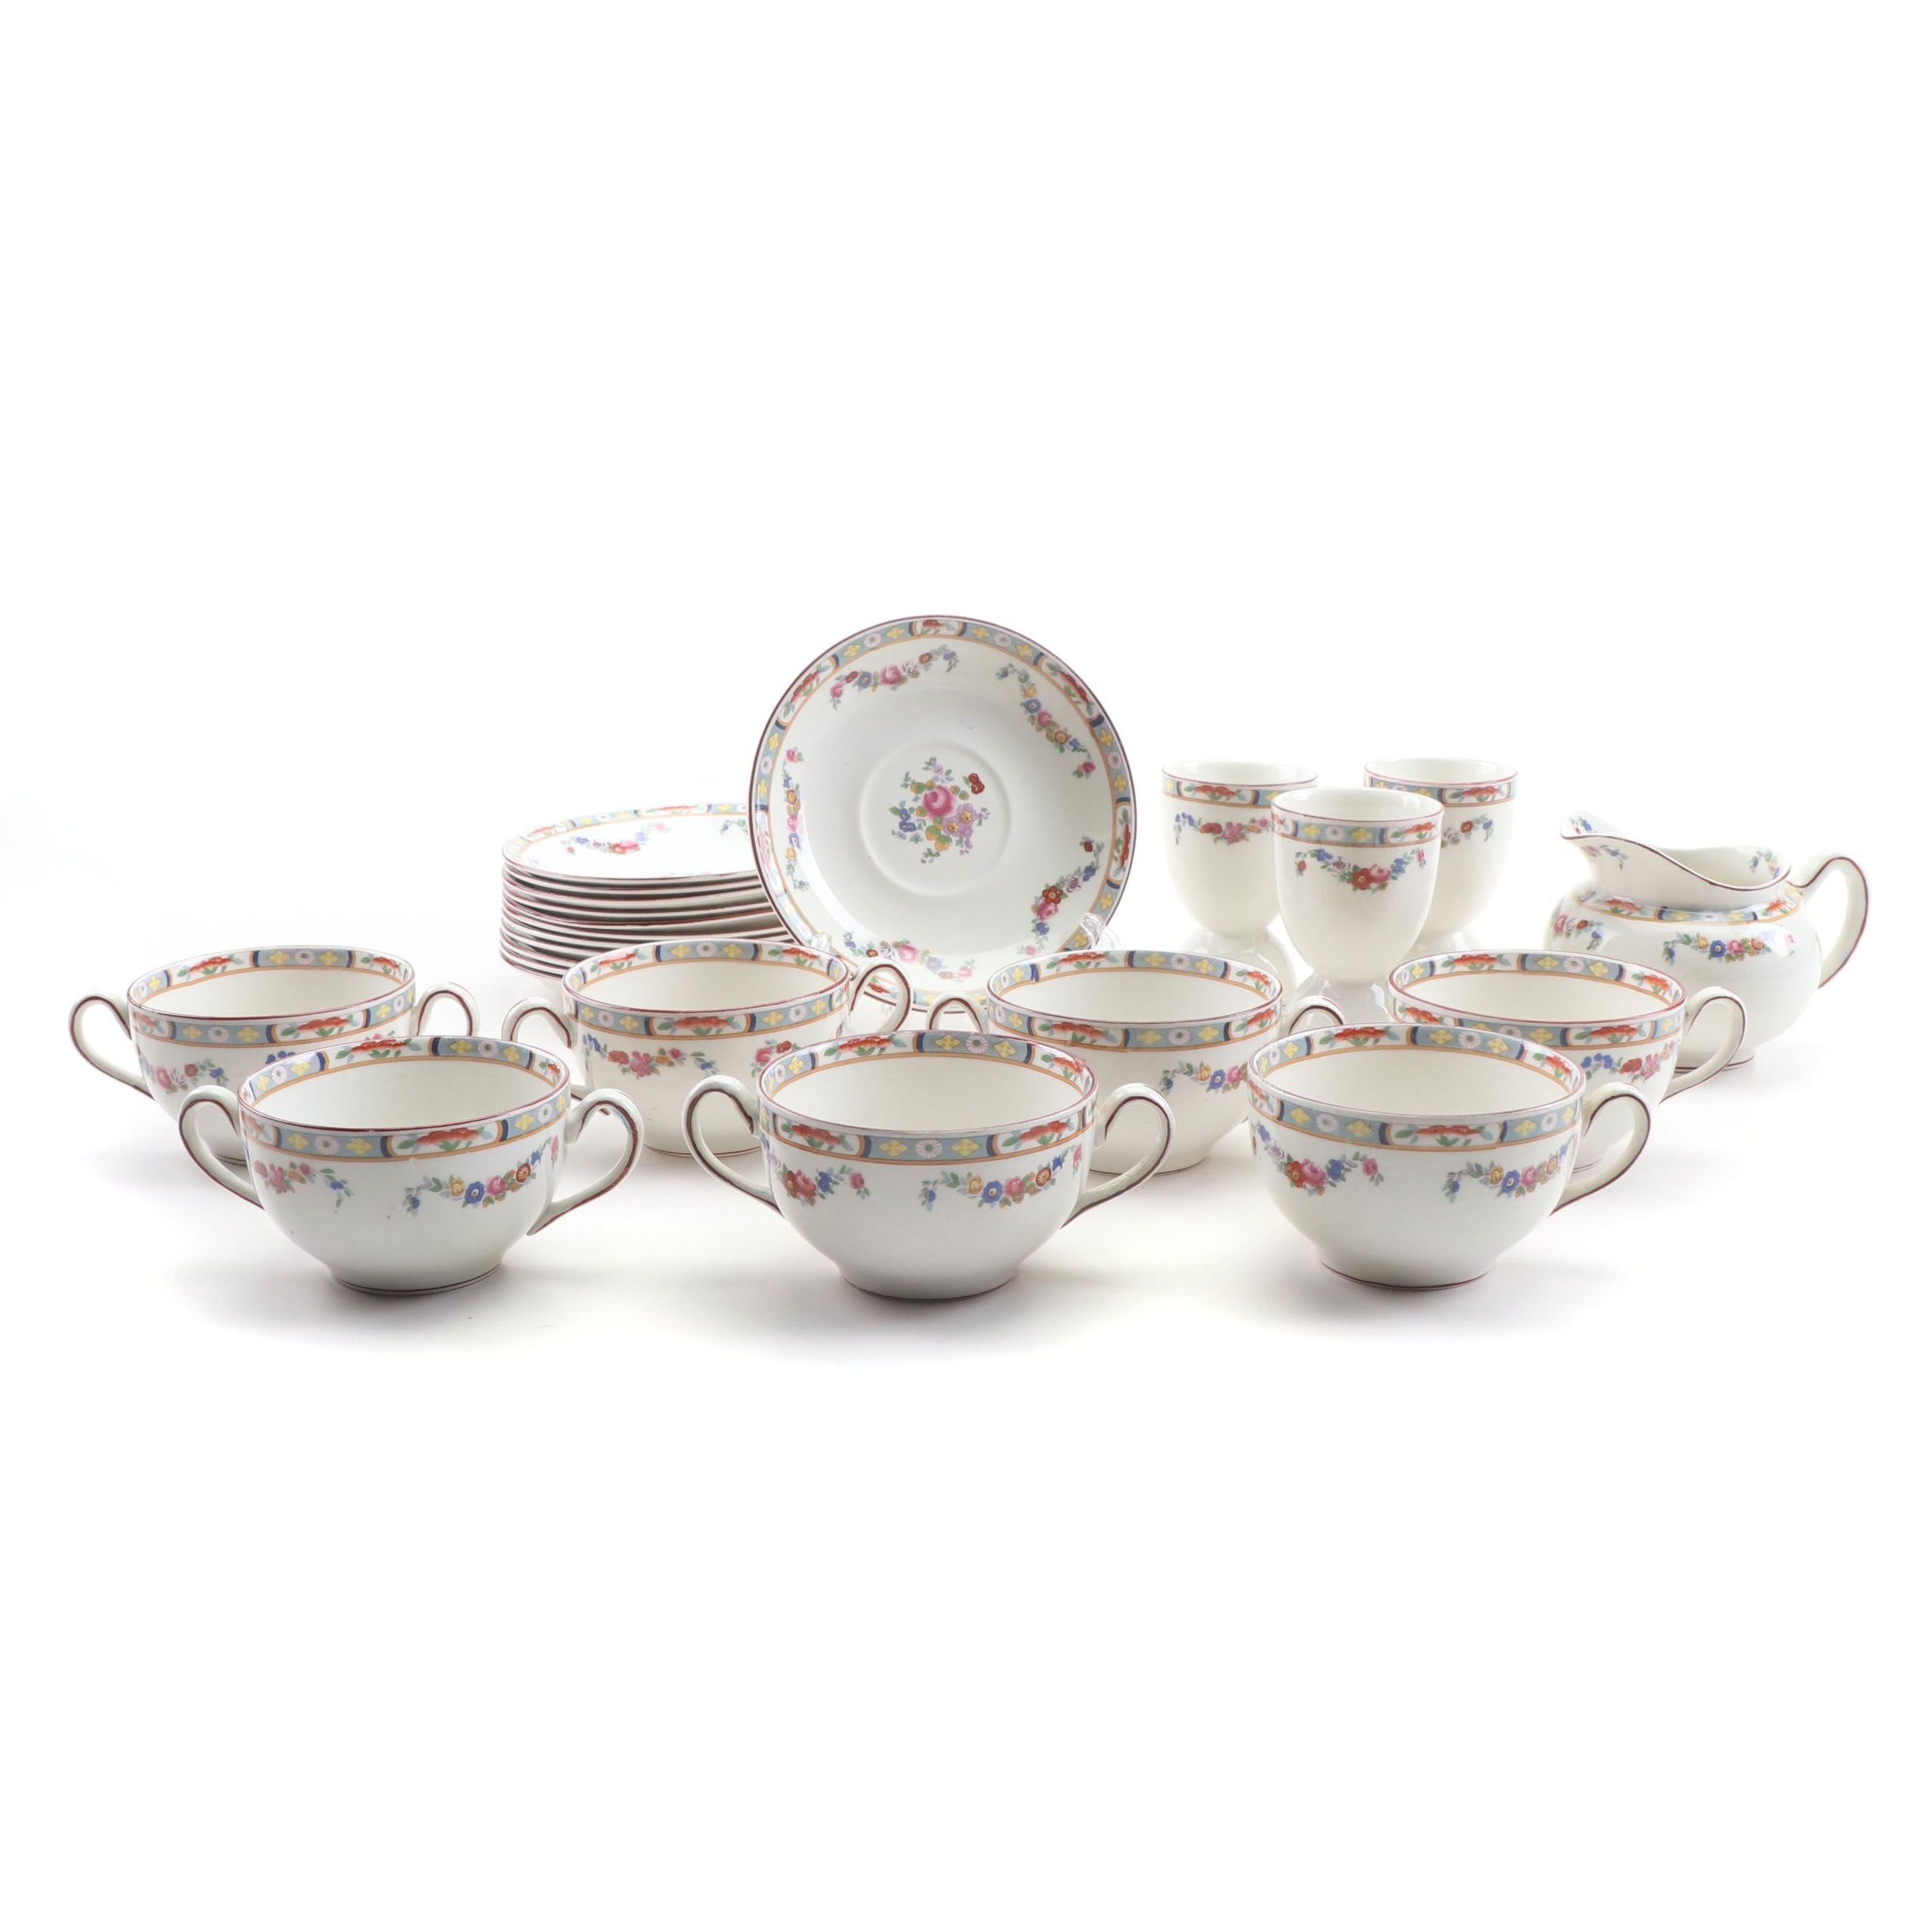 J&G Meakin Ceramic Dinnerware, Late 19th Century